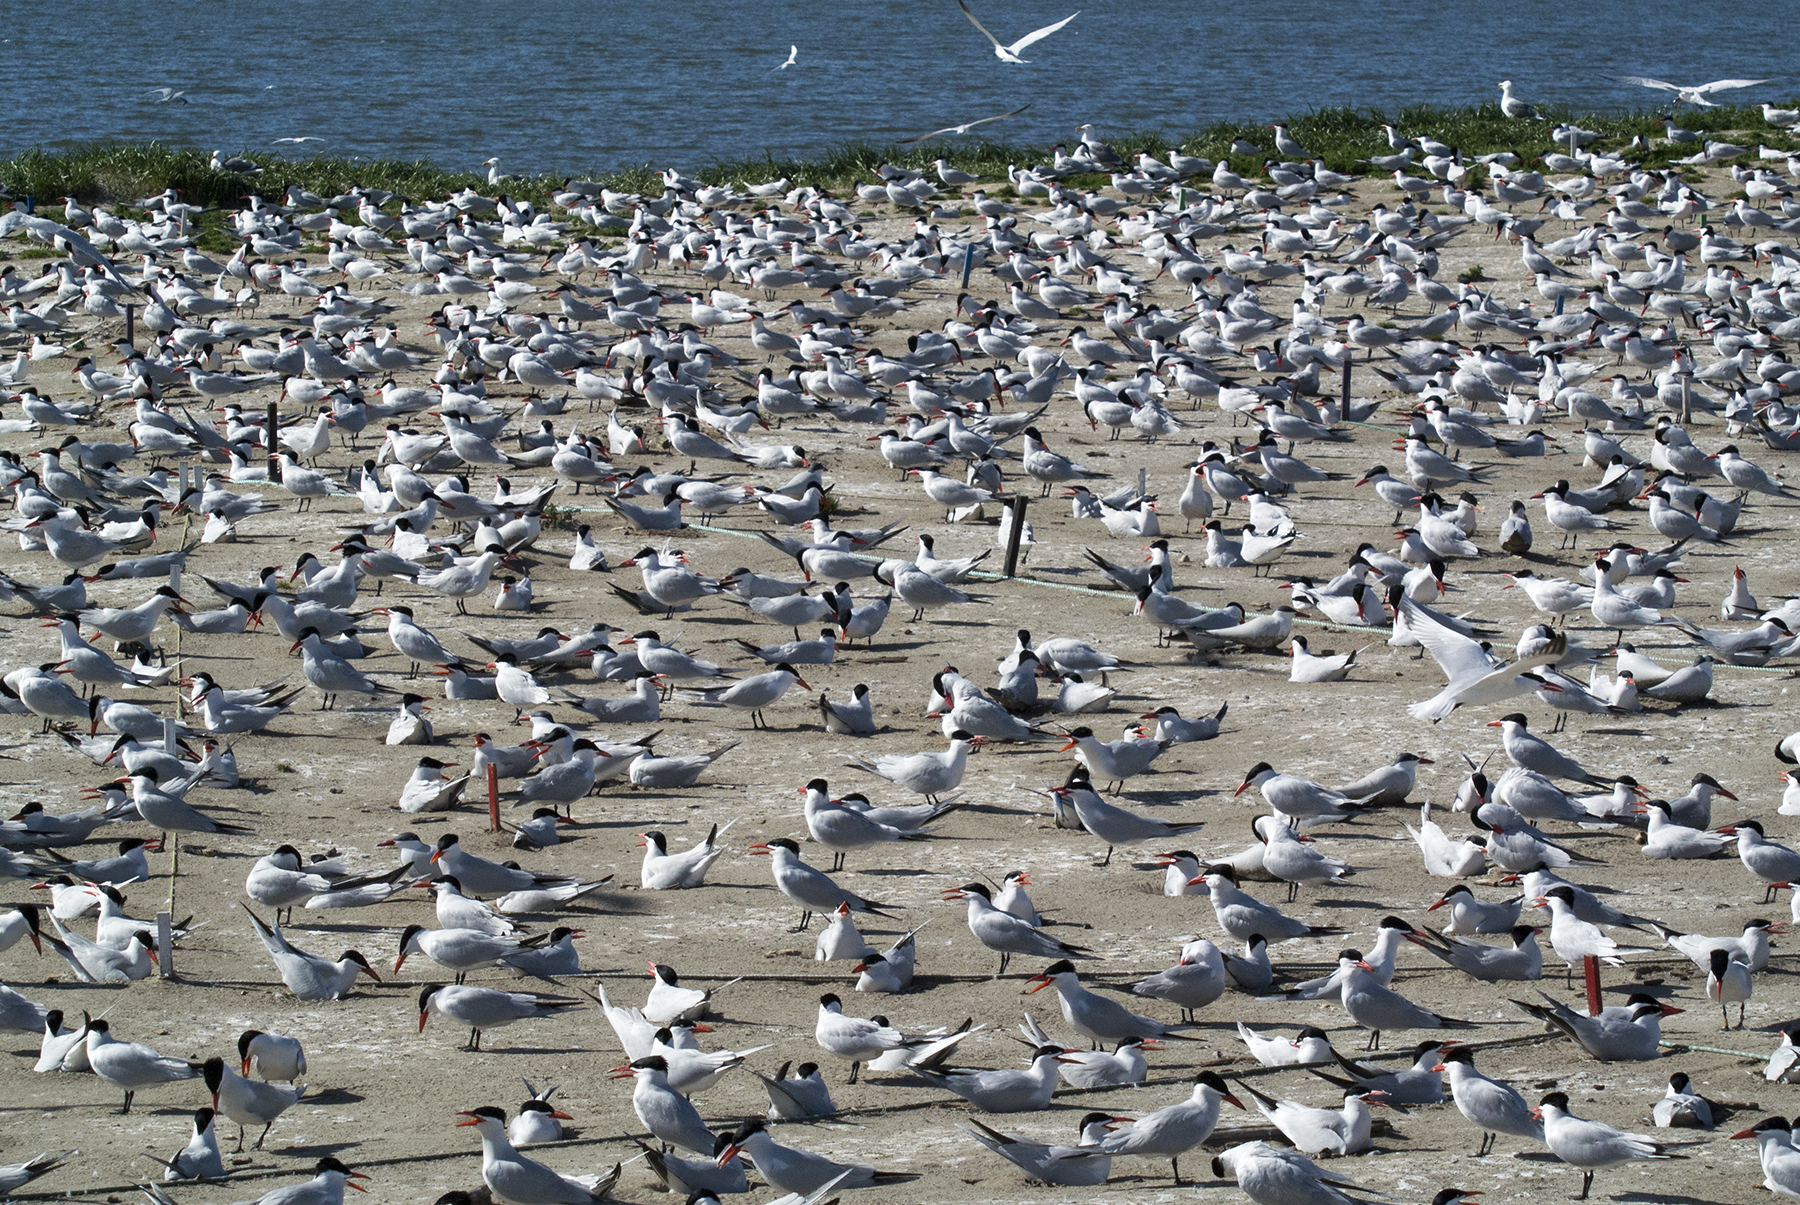 The Caspian Tern Colony in the Columbia River Estuary